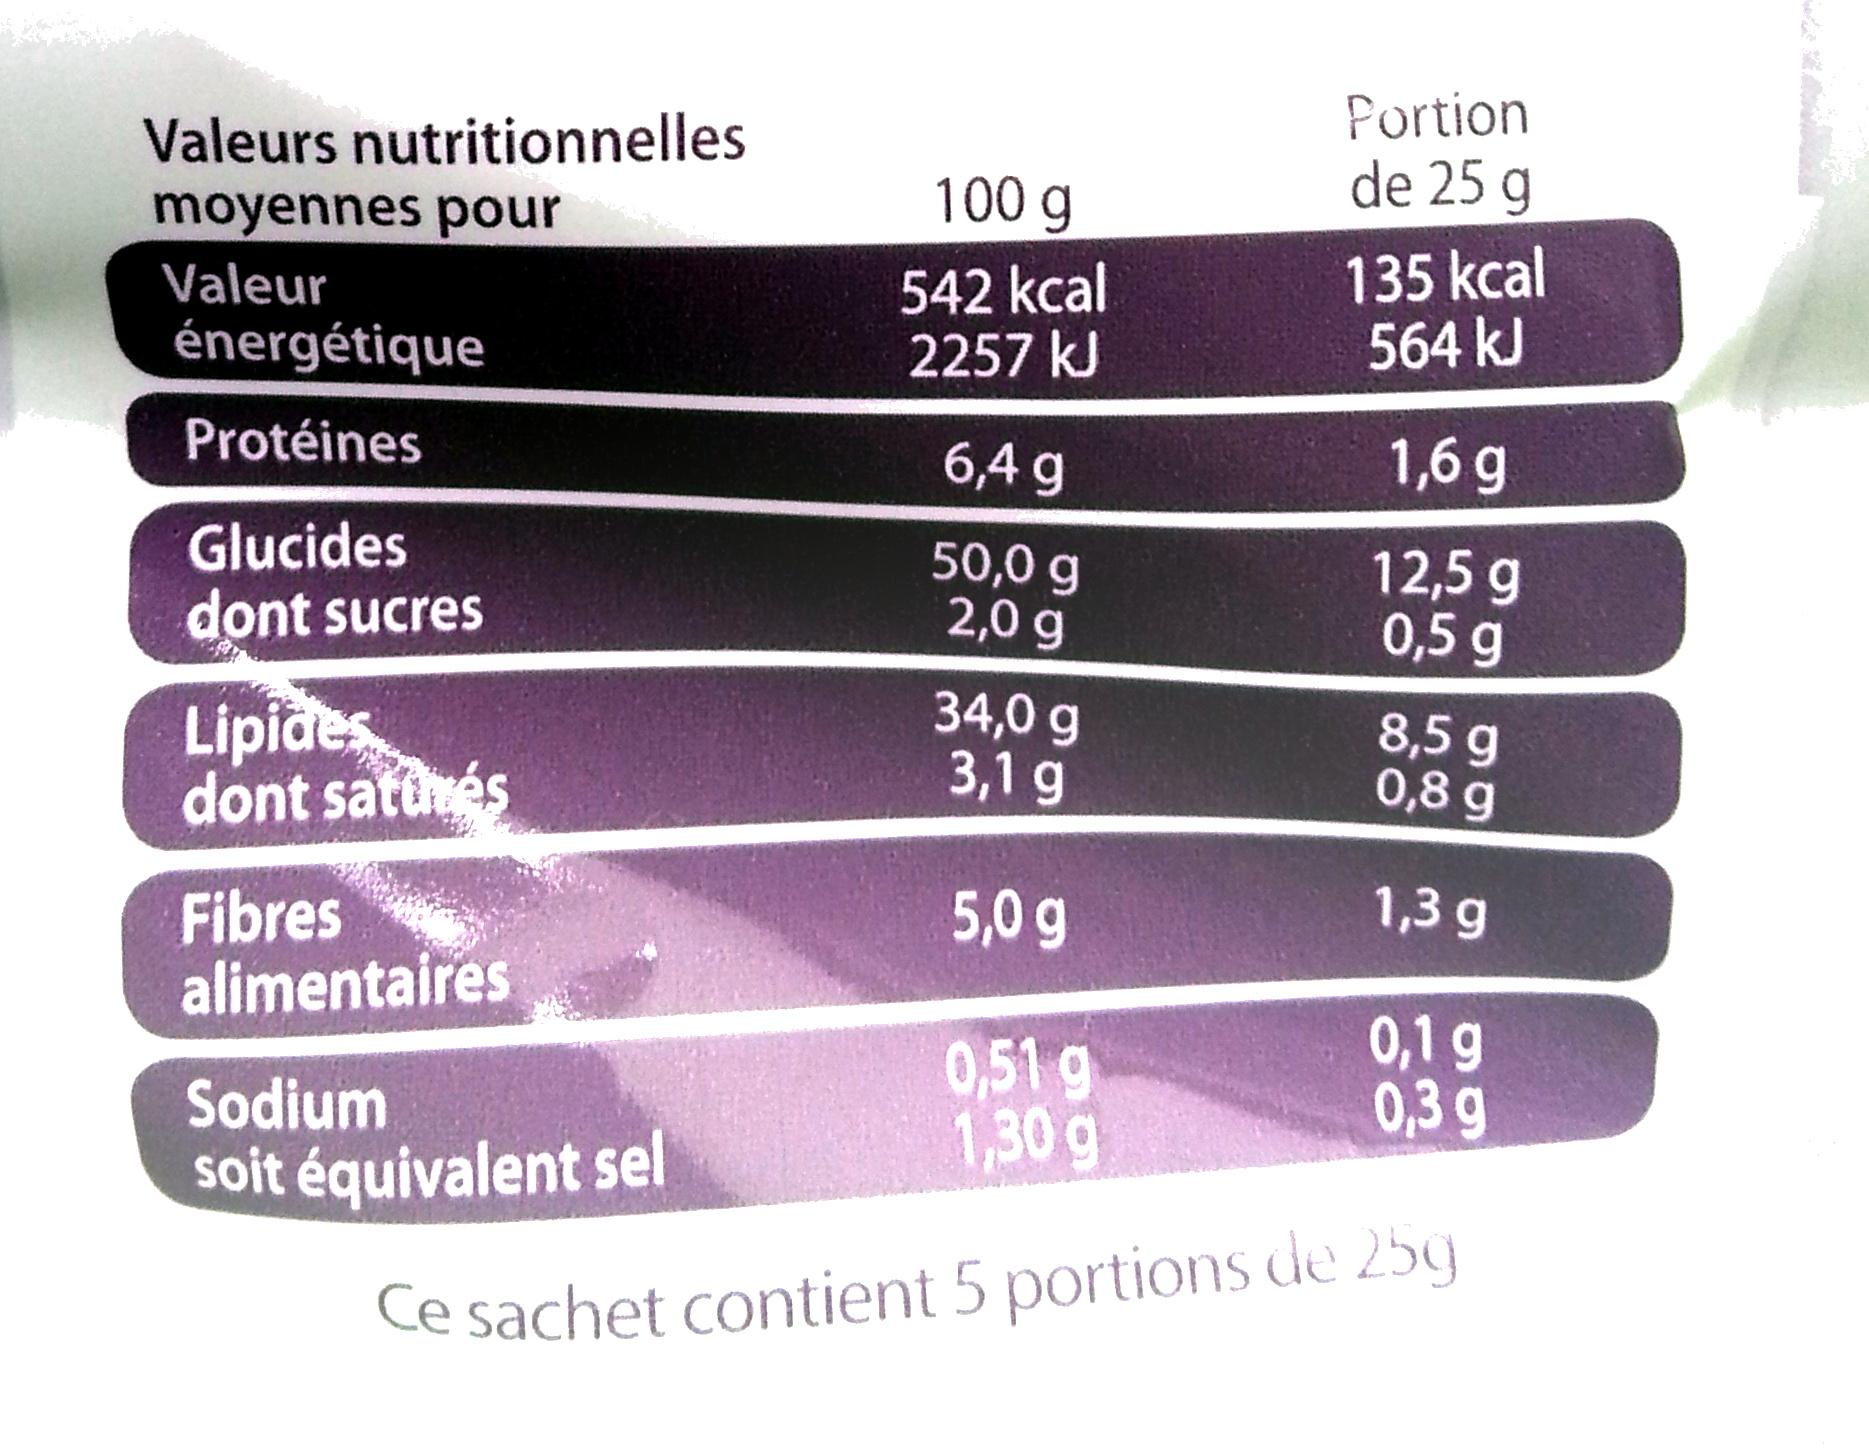 Chips pommes de terre rôties Ail & Romarin - Informations nutritionnelles - fr